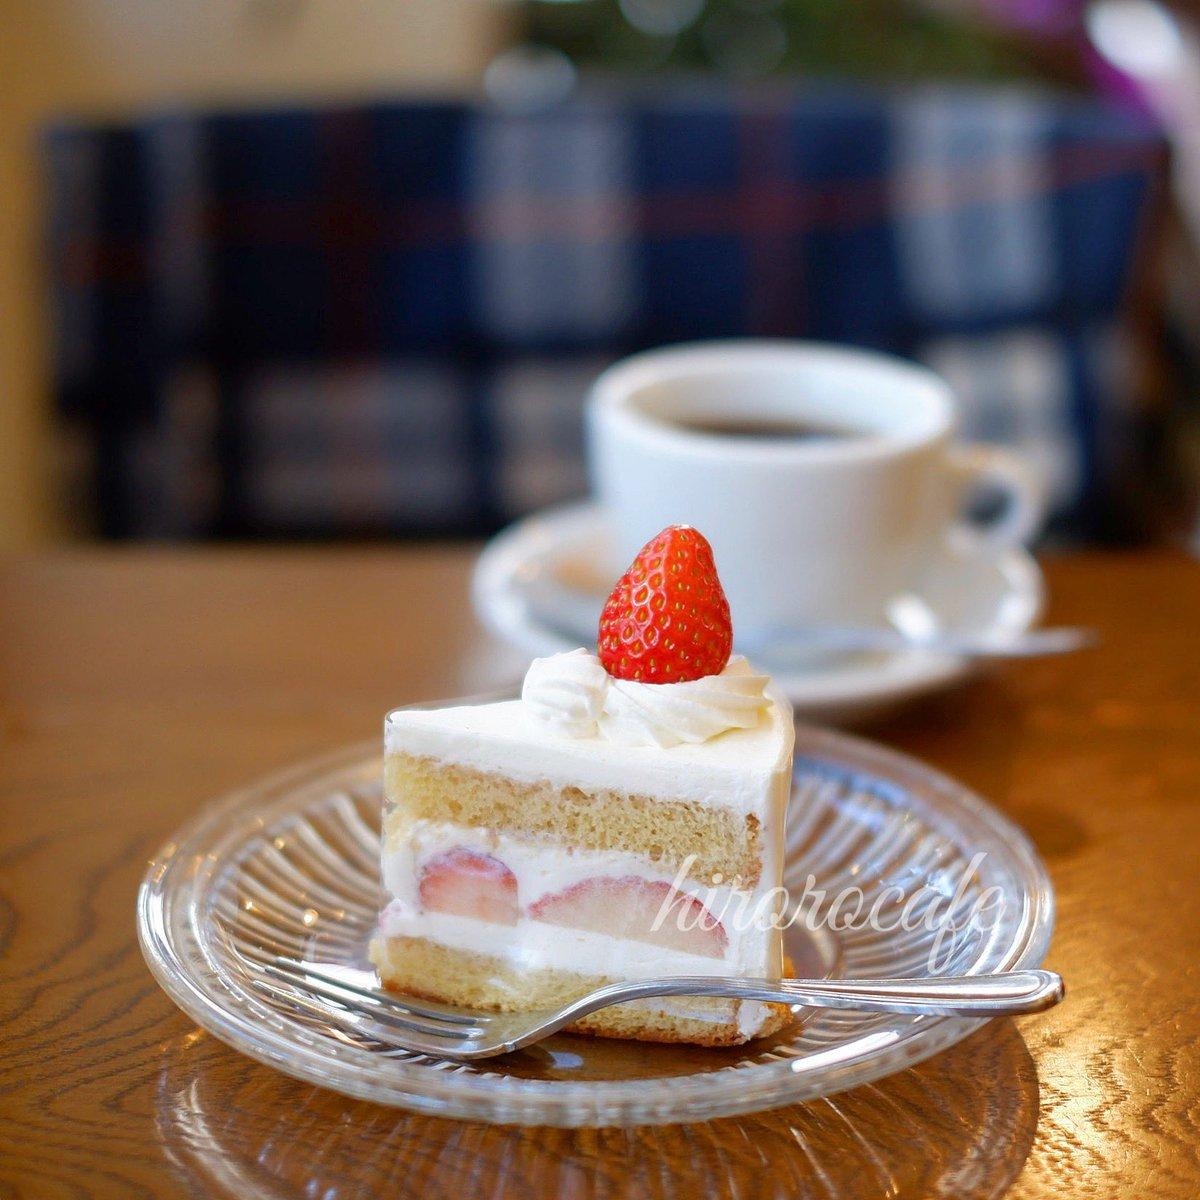 KNETENさんで頂いた、苺のショートケーキ🍰 いちごは栃木県産減農薬のもの、スポンジは国産小麦&平飼い卵、生クリームは北海道産。 素材にこだわられたショートケーキです🙂 #カフェ #カフェ巡り #cafe #クネーテン #kneten #ショートケーキ #🍰